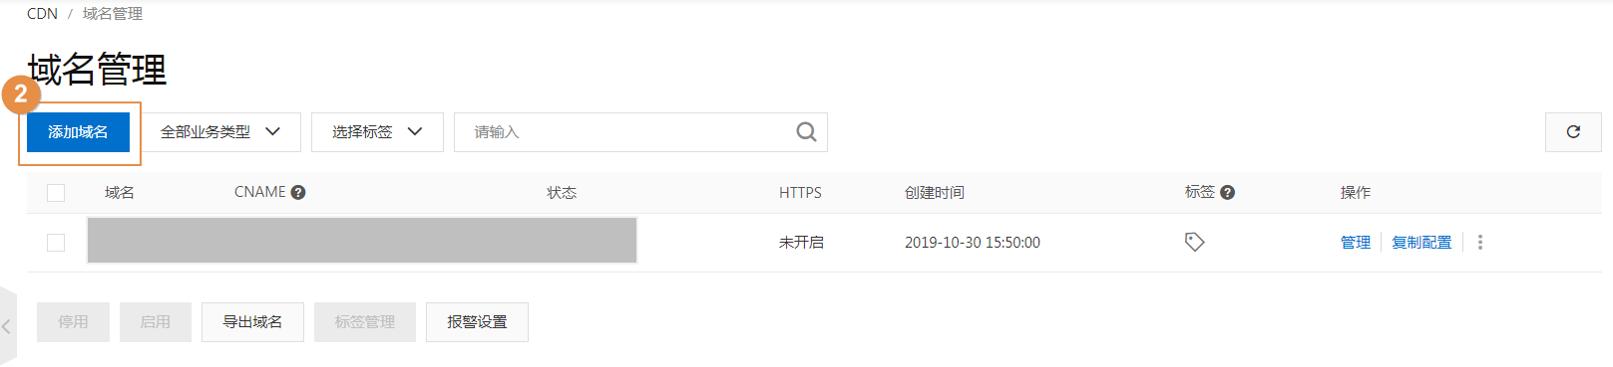 CDN添加域名